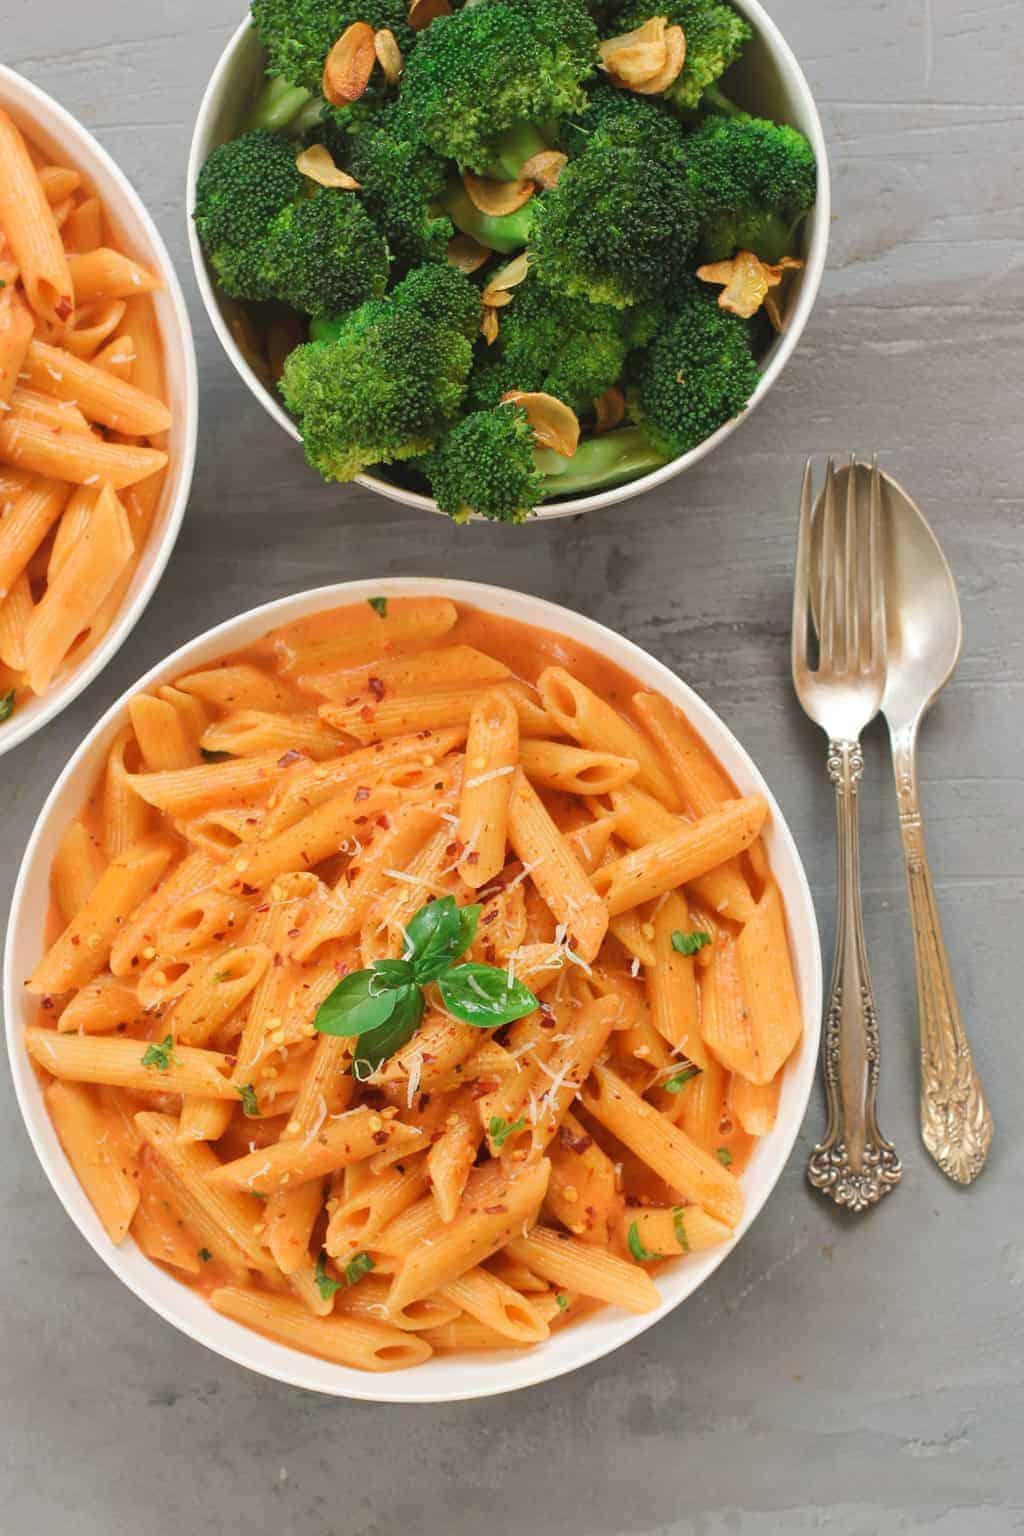 Pasta with Creamy Tomato Sauce